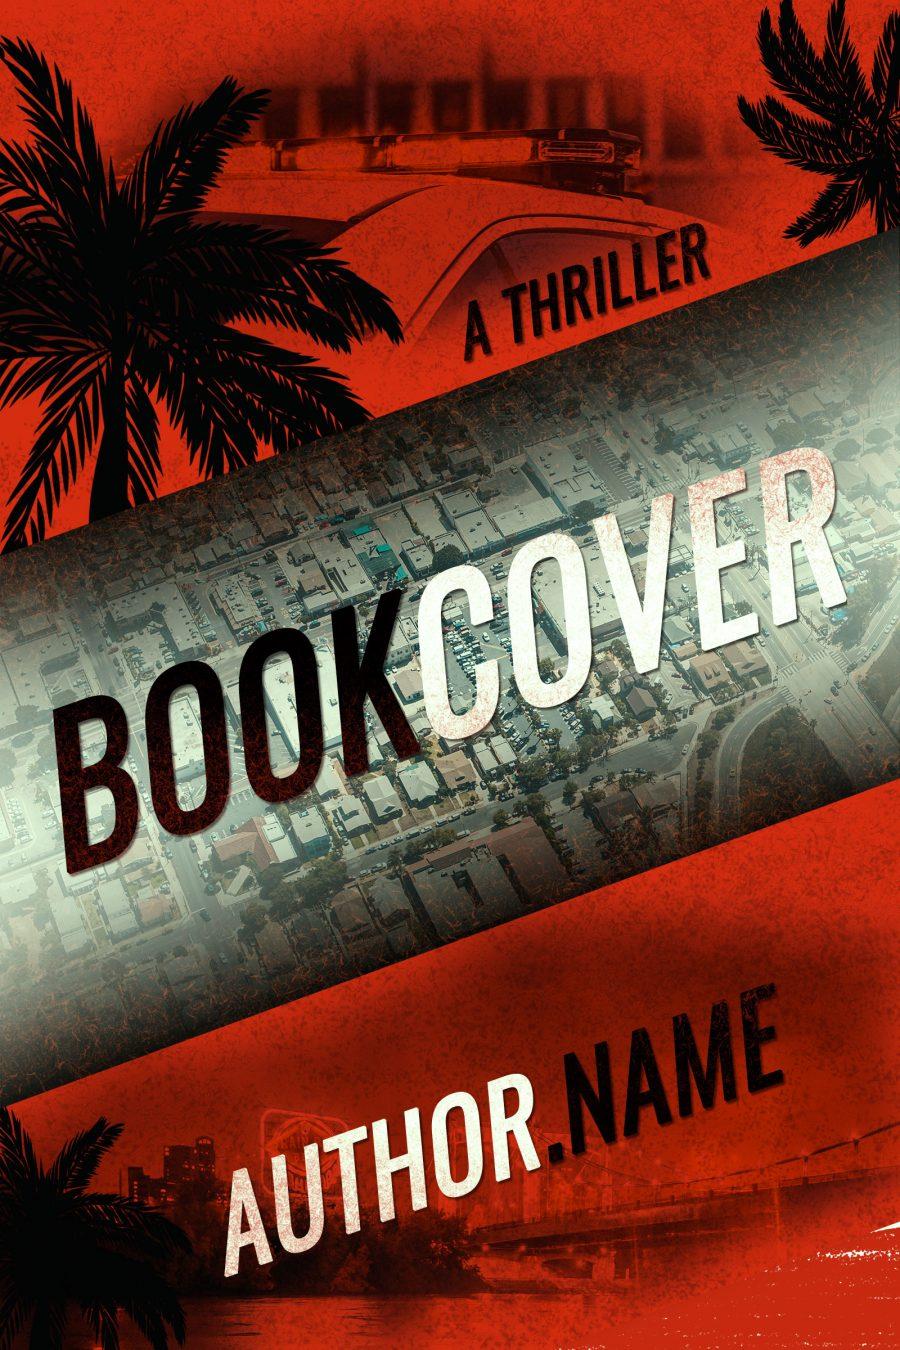 A thriller premade book cover made by pora's designs